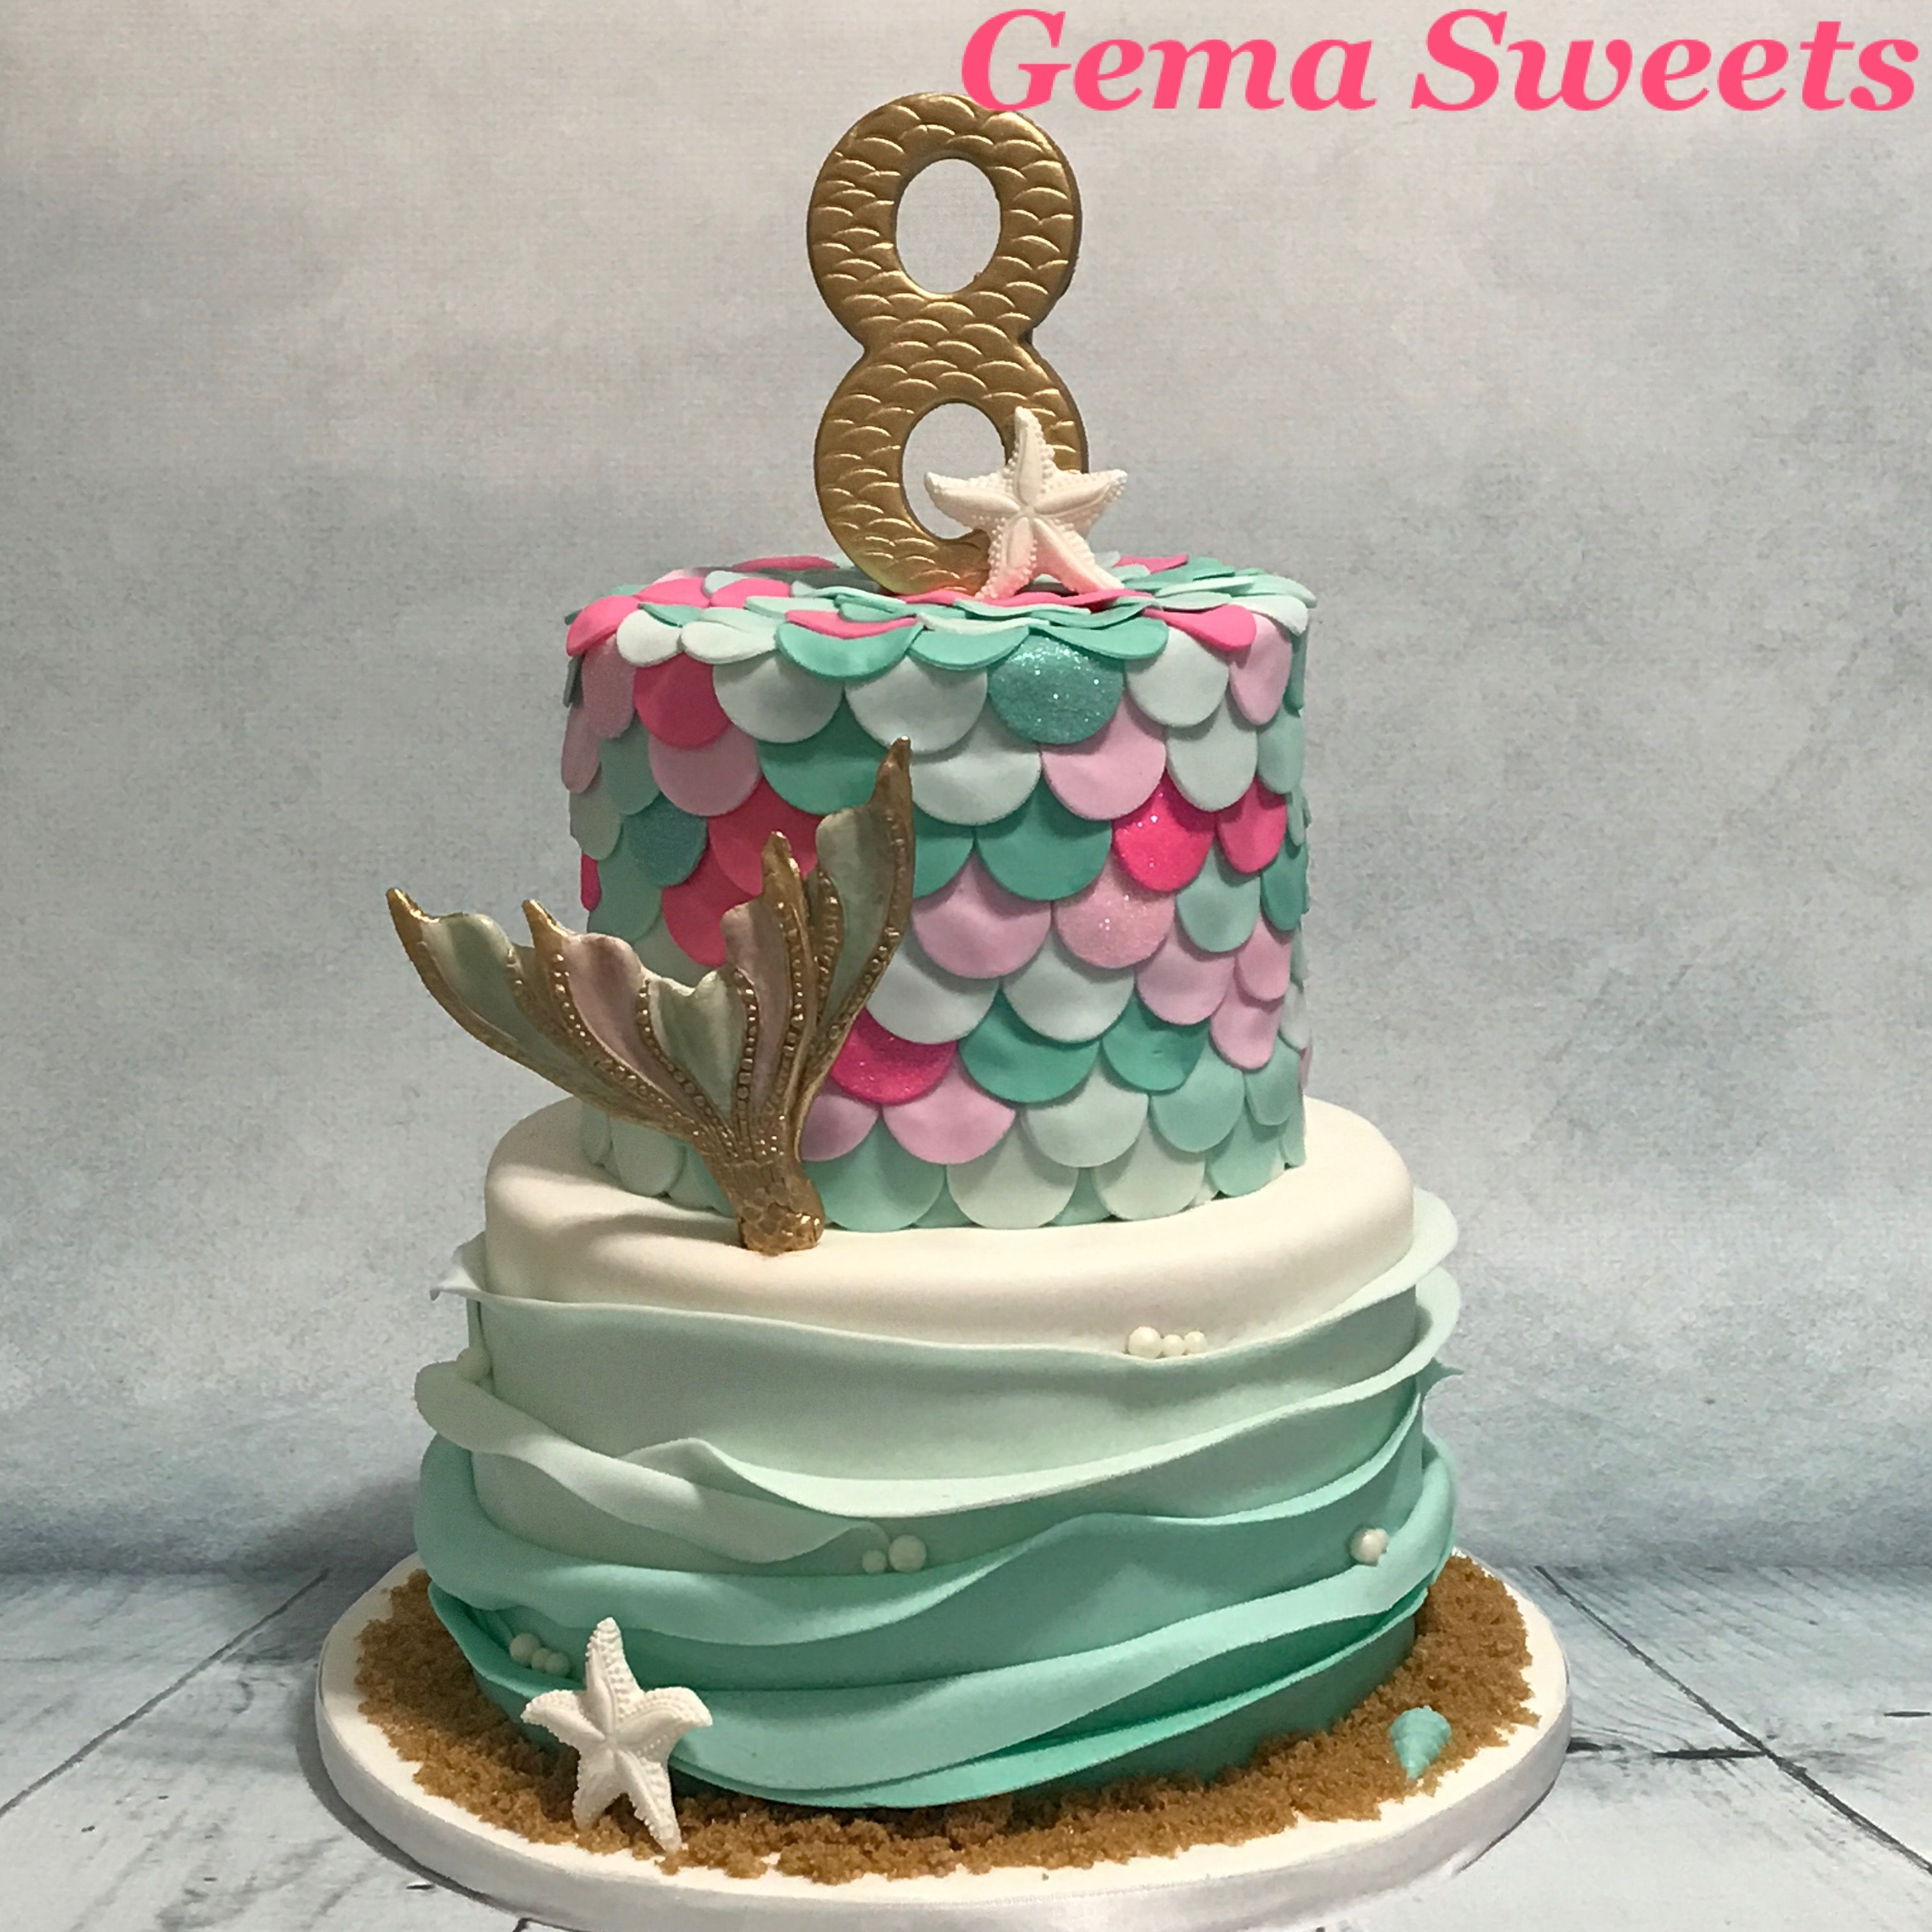 Mermaid Under The Sea Cake By Gema Sweets